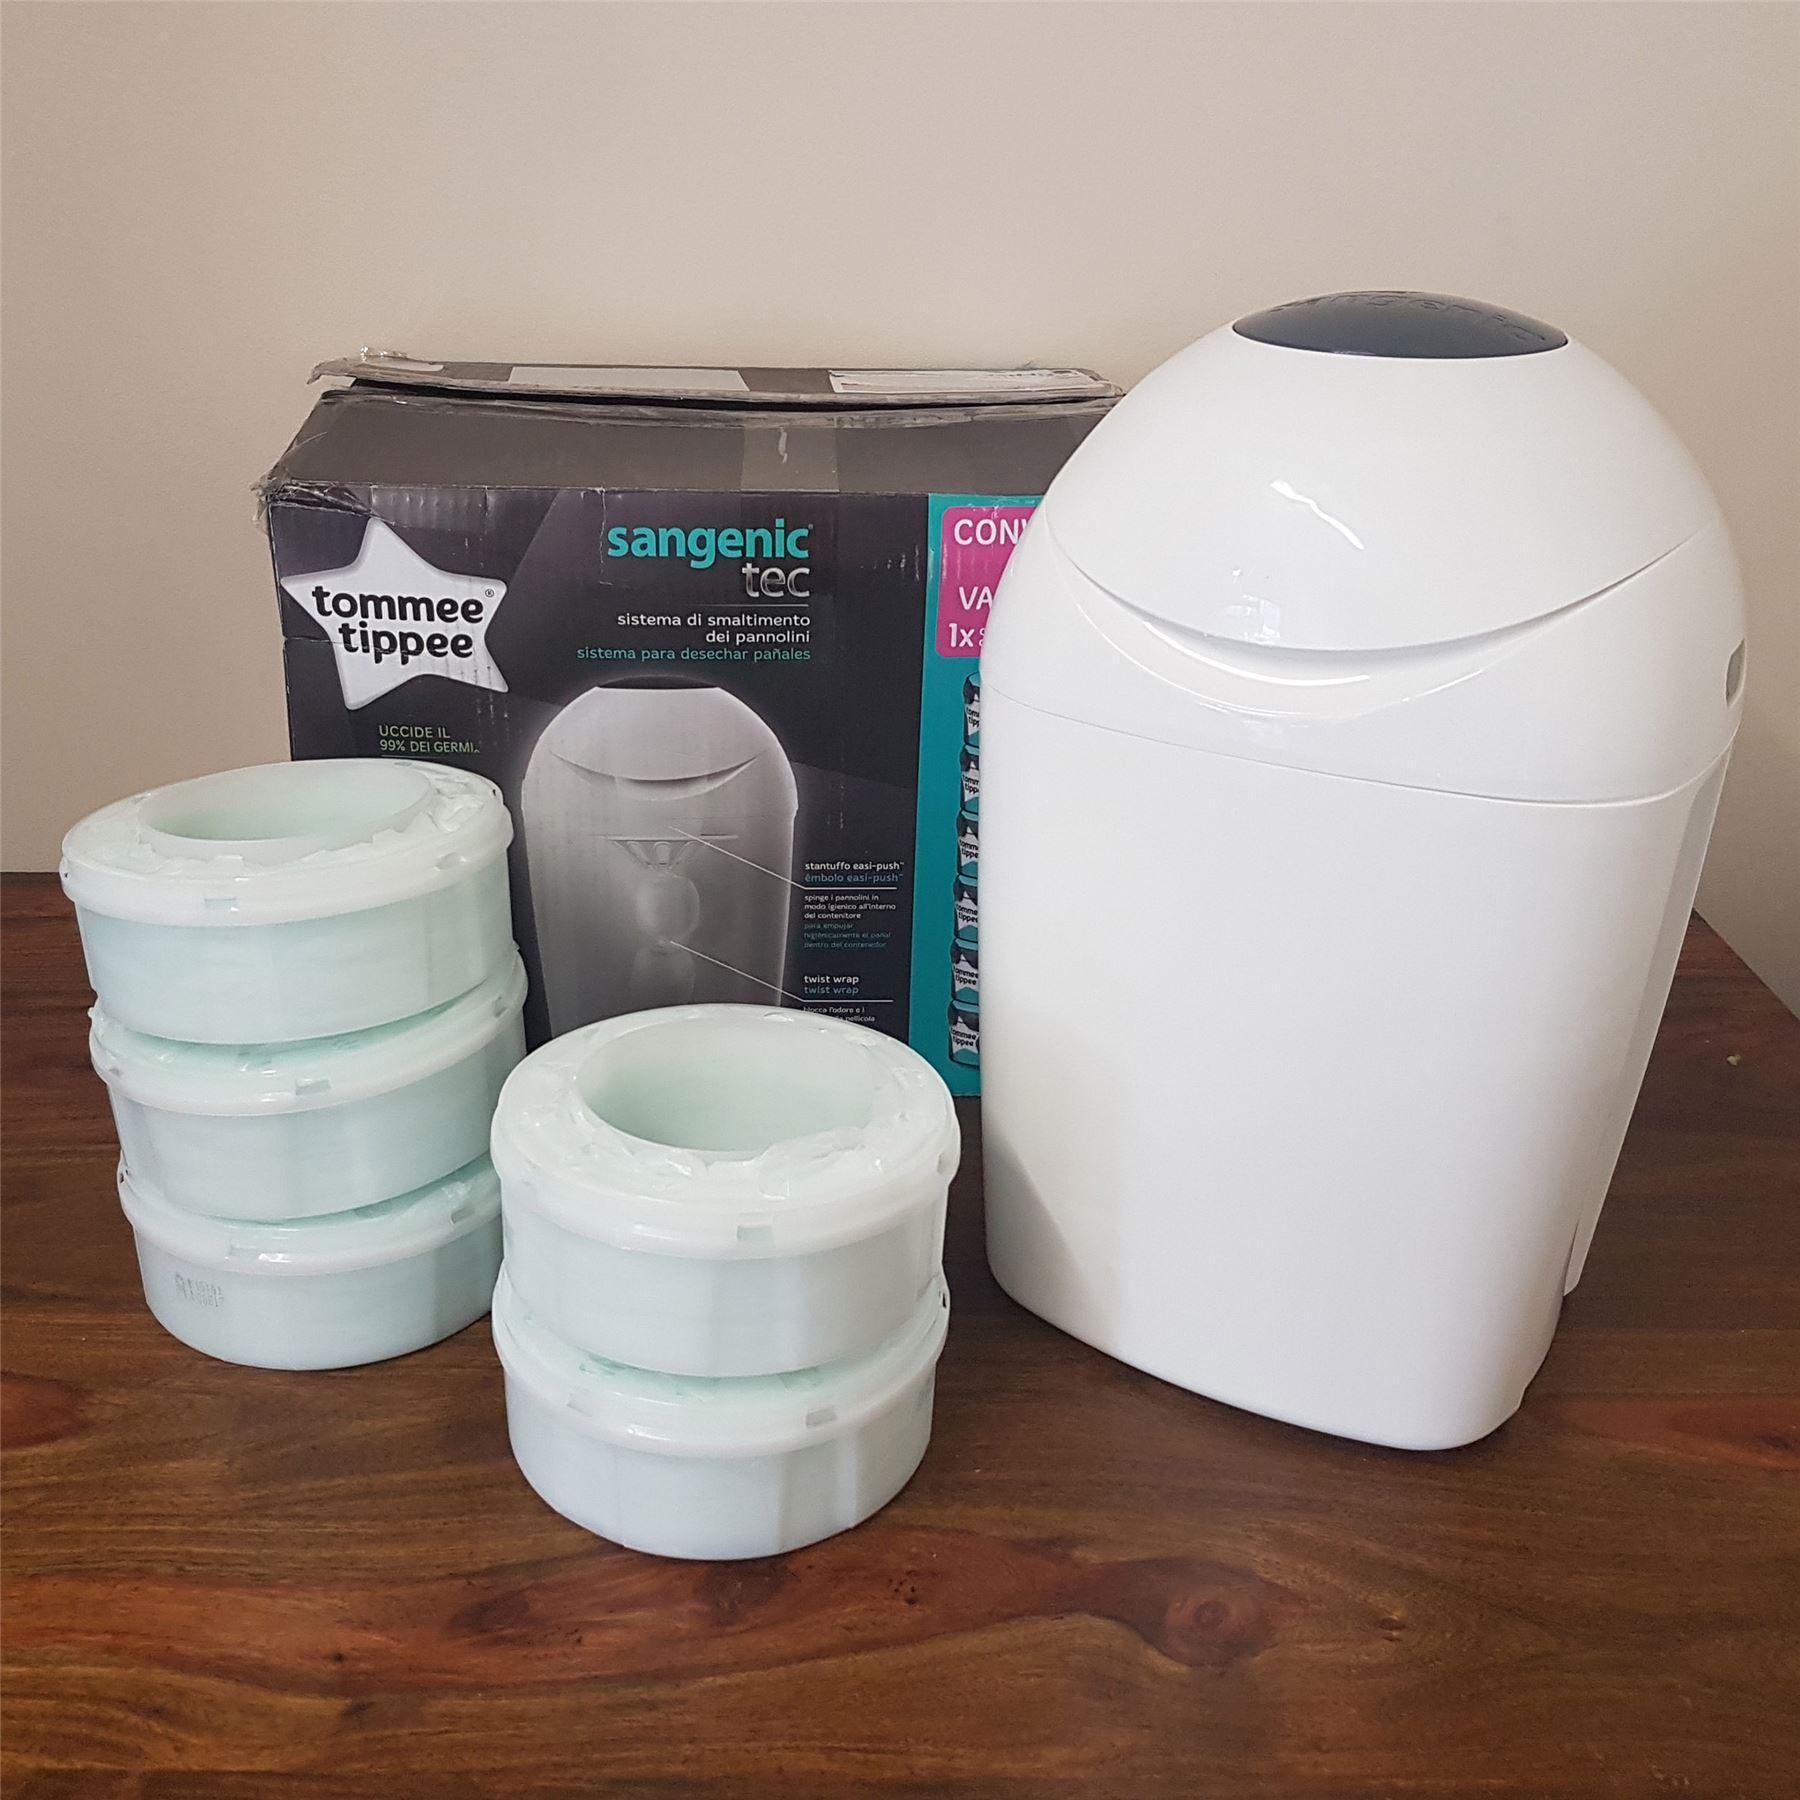 tommee tippee sangenic tec nappy bin starter set kit 6. Black Bedroom Furniture Sets. Home Design Ideas